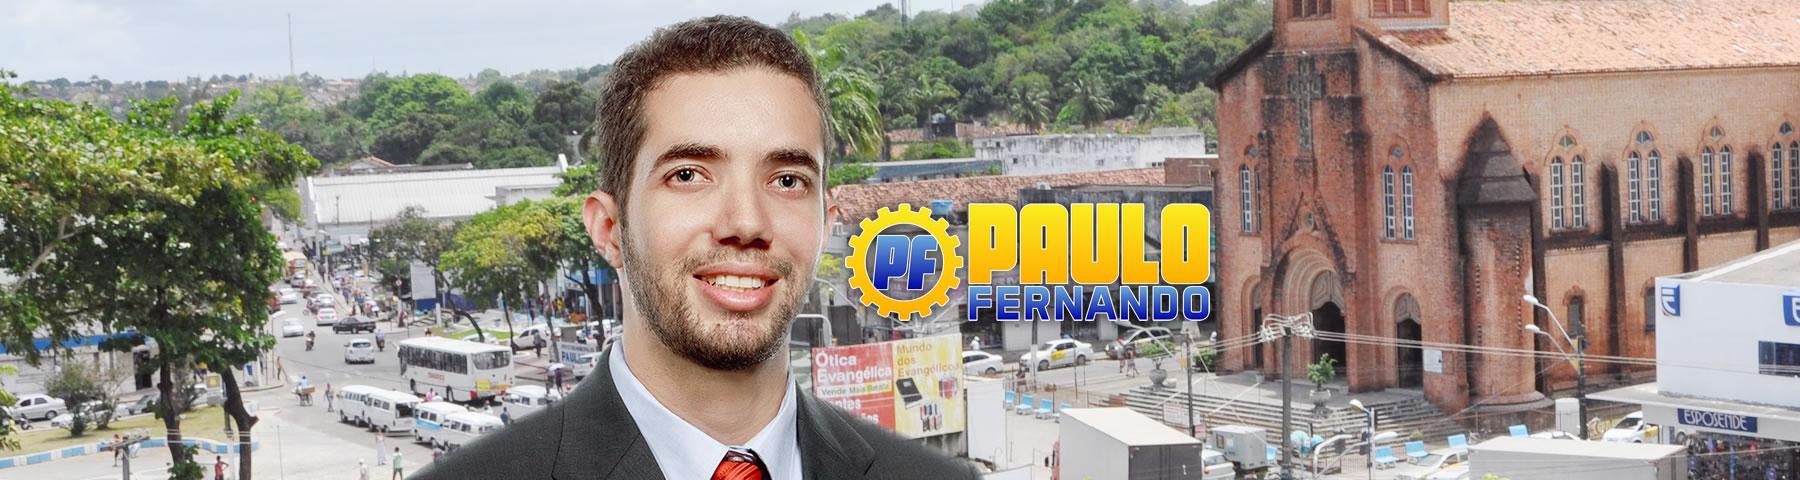 Juntos com Paulo Fernando